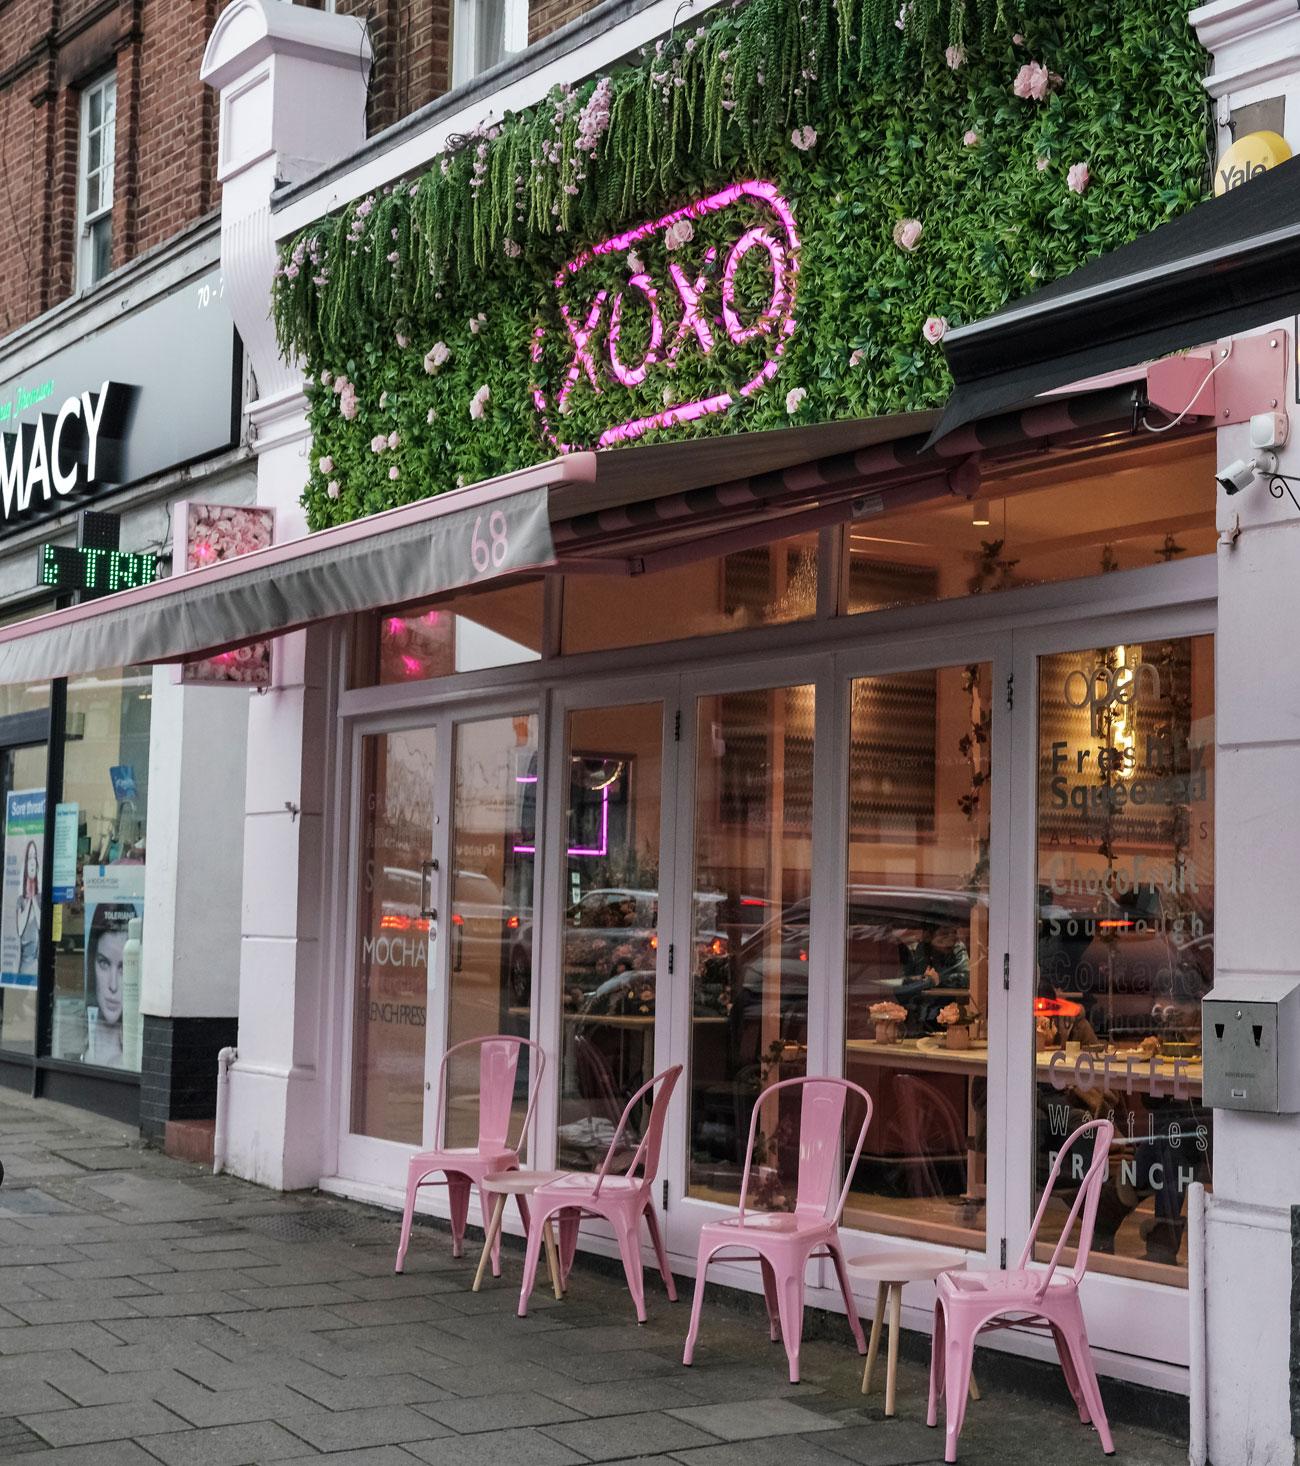 xoxo-External-Front-View